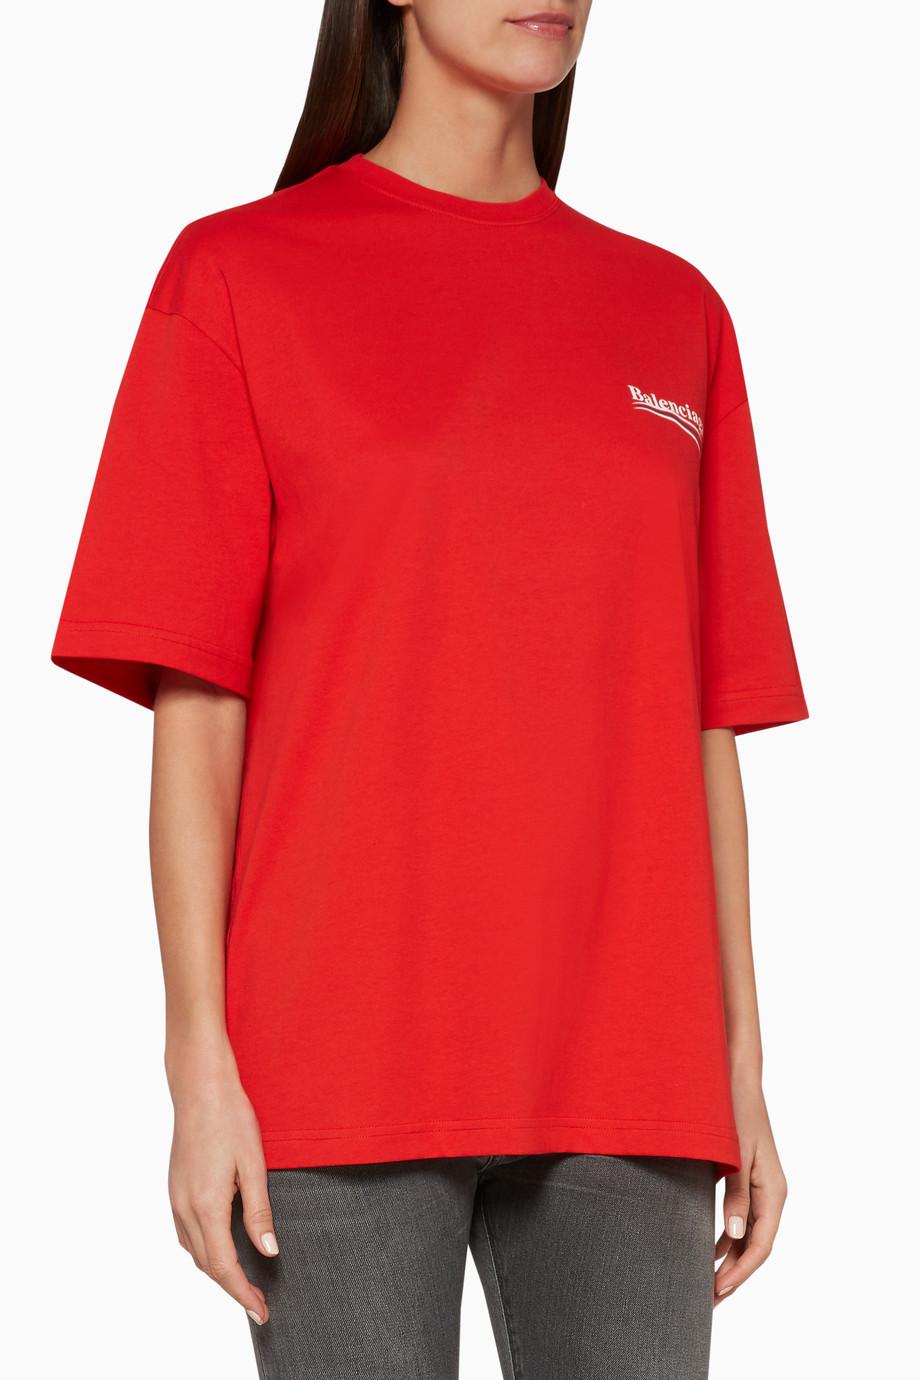 921f730a Shop Balenciaga Red Red Political Logo Oversized T-Shirt for Women ...